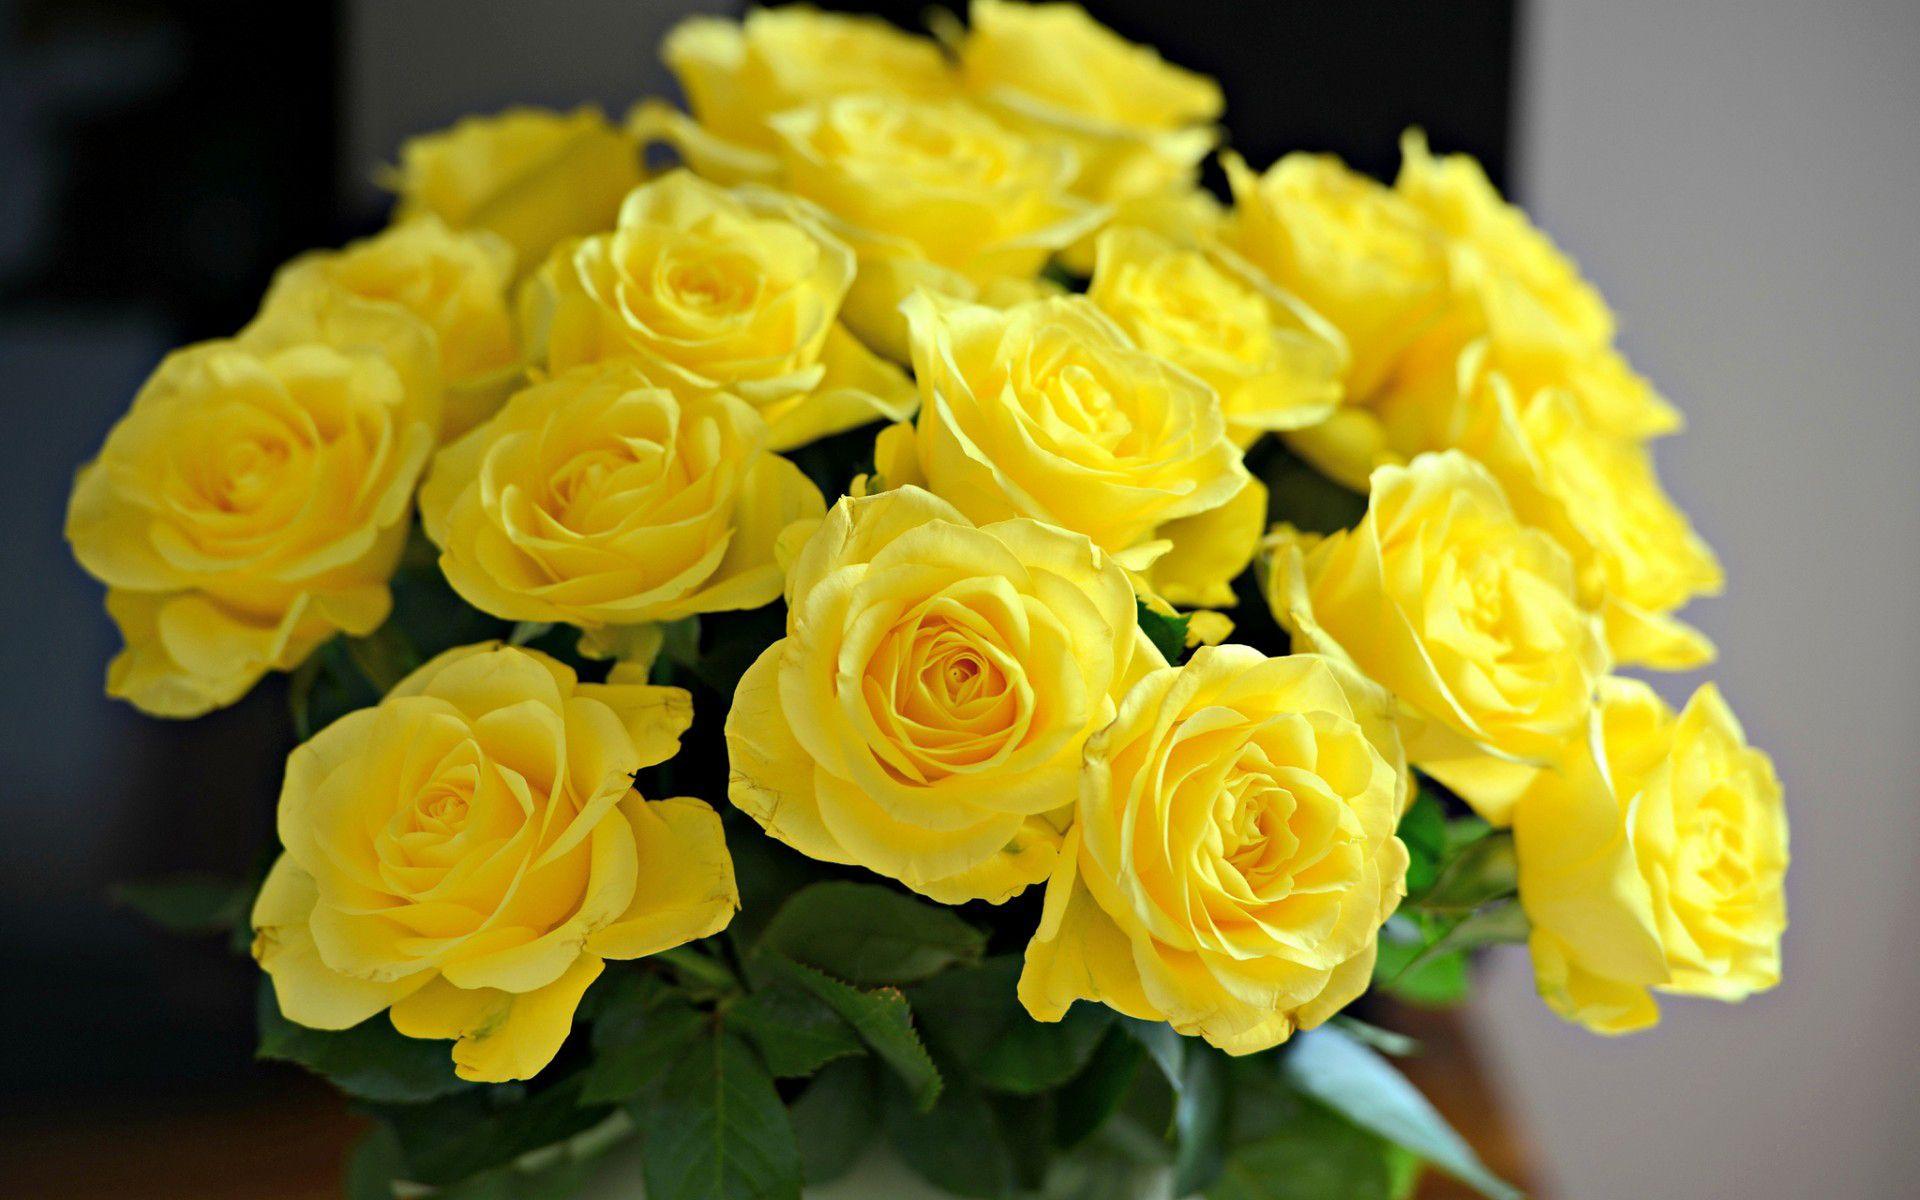 Rose Hd Latest Wallpaper Free Download New Hd Wallpapers Download Rose Flower Pictures Rose Flower Wallpaper Yellow Rose Flower